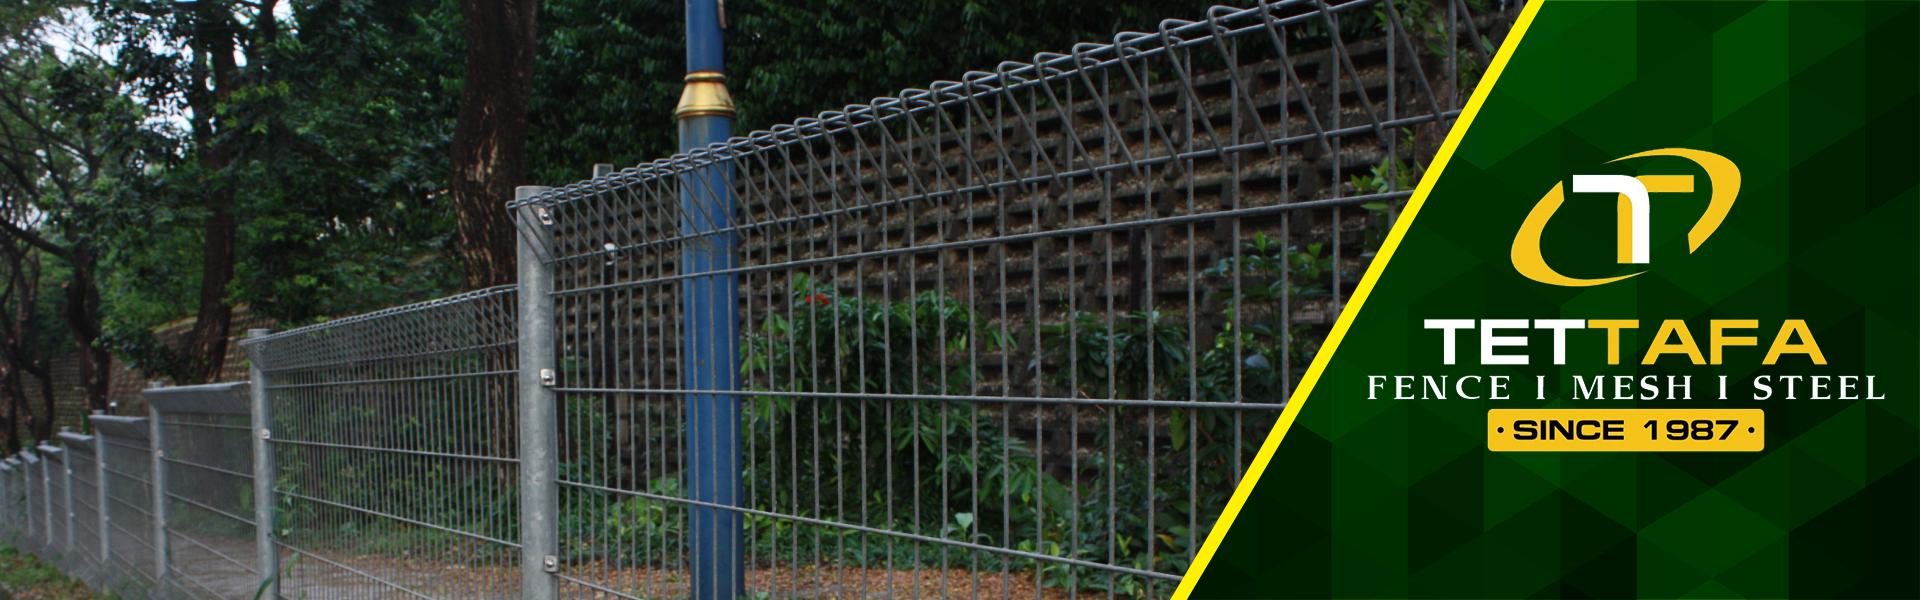 Anti Climb Fence Manufacturer in Malaysia | TET Tafa